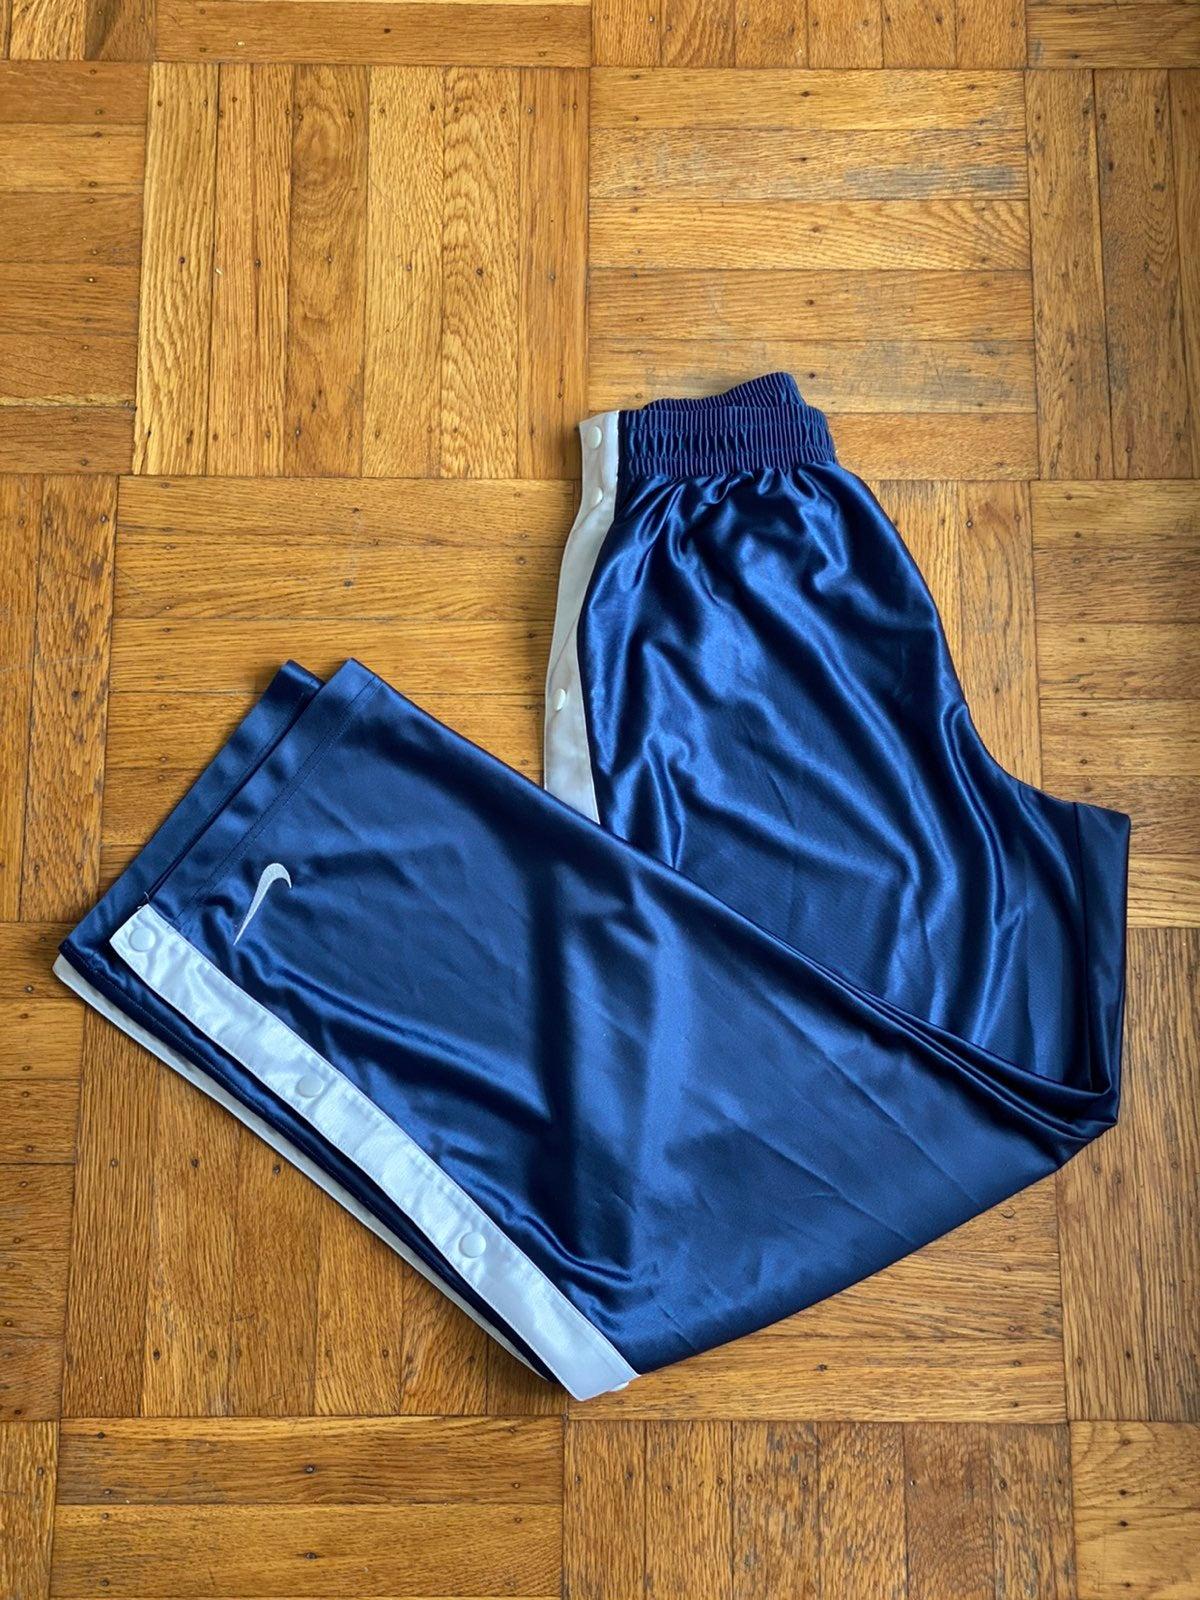 Vintage 90s White Label Nike Tearaway Track Pants Sz L